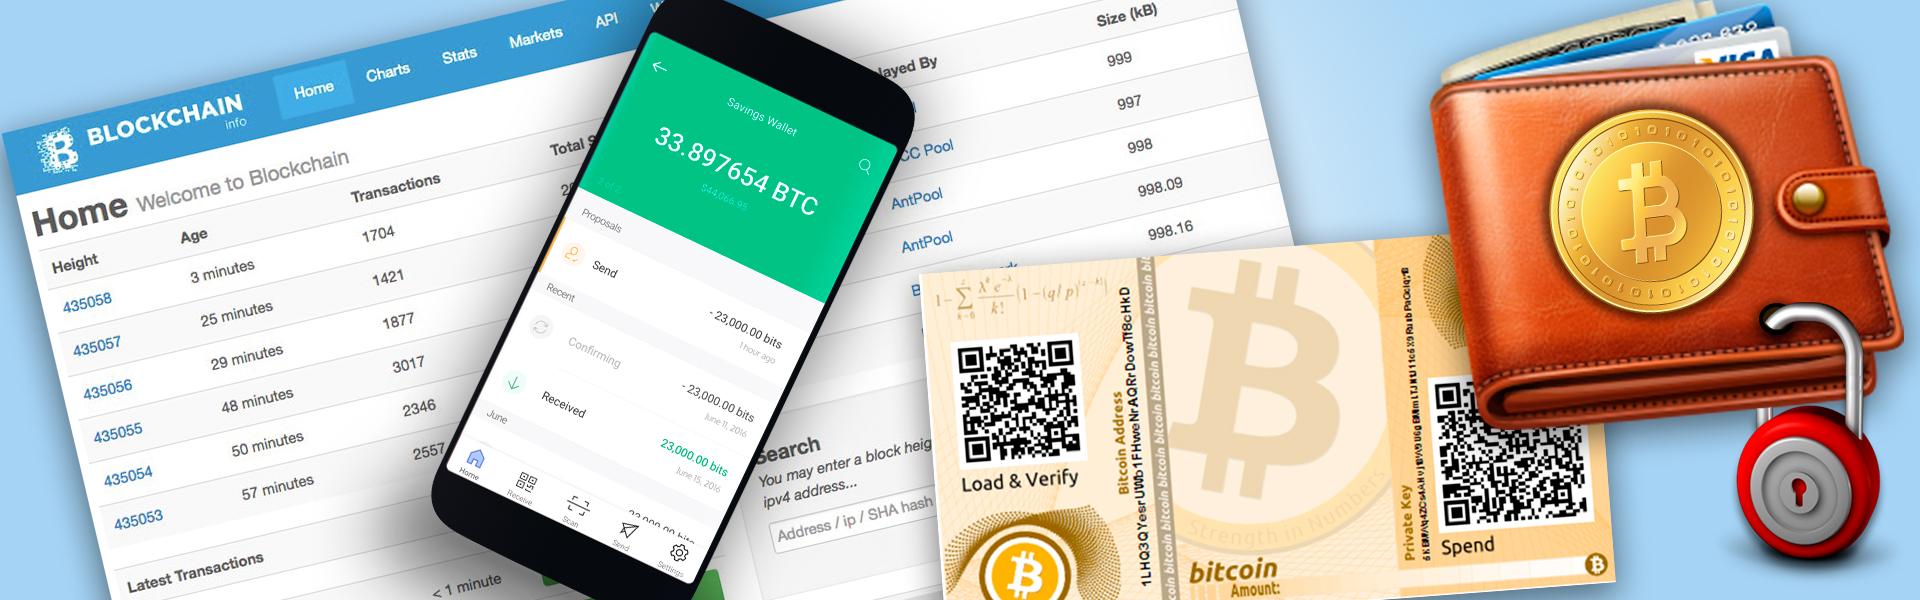 Melhores Carteiras Bitcoin